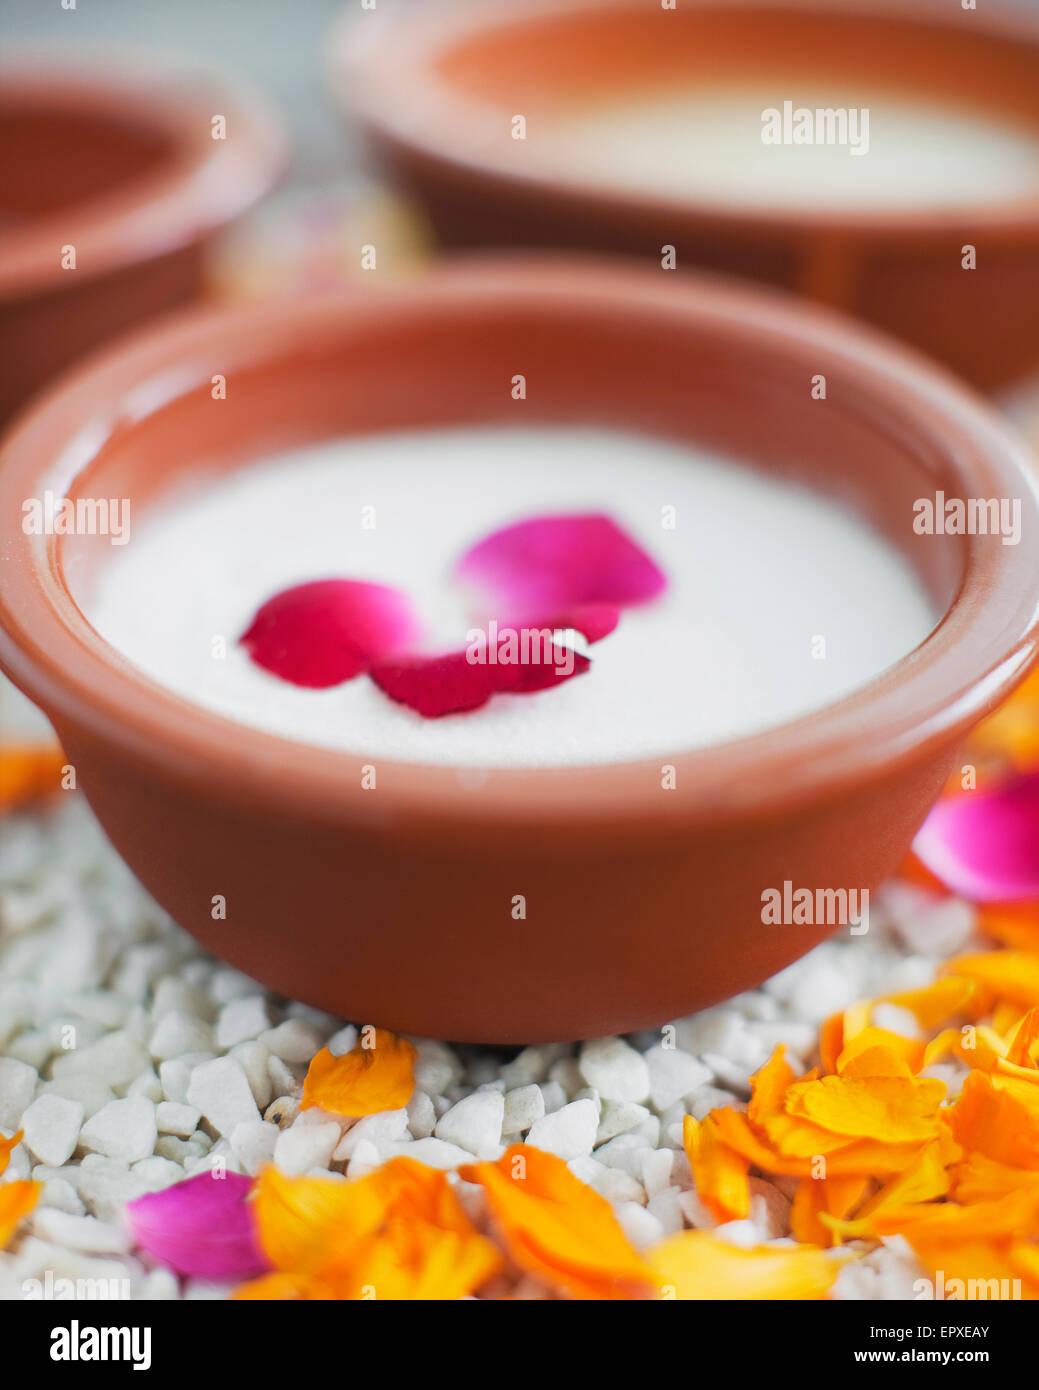 Wild Rose Salt Glow at Ananda Spa, Ananda in the Himalayas, The Palace Estate, Narendra Nagar, Tehri Garhwal, Uttarakhand, - Stock Image